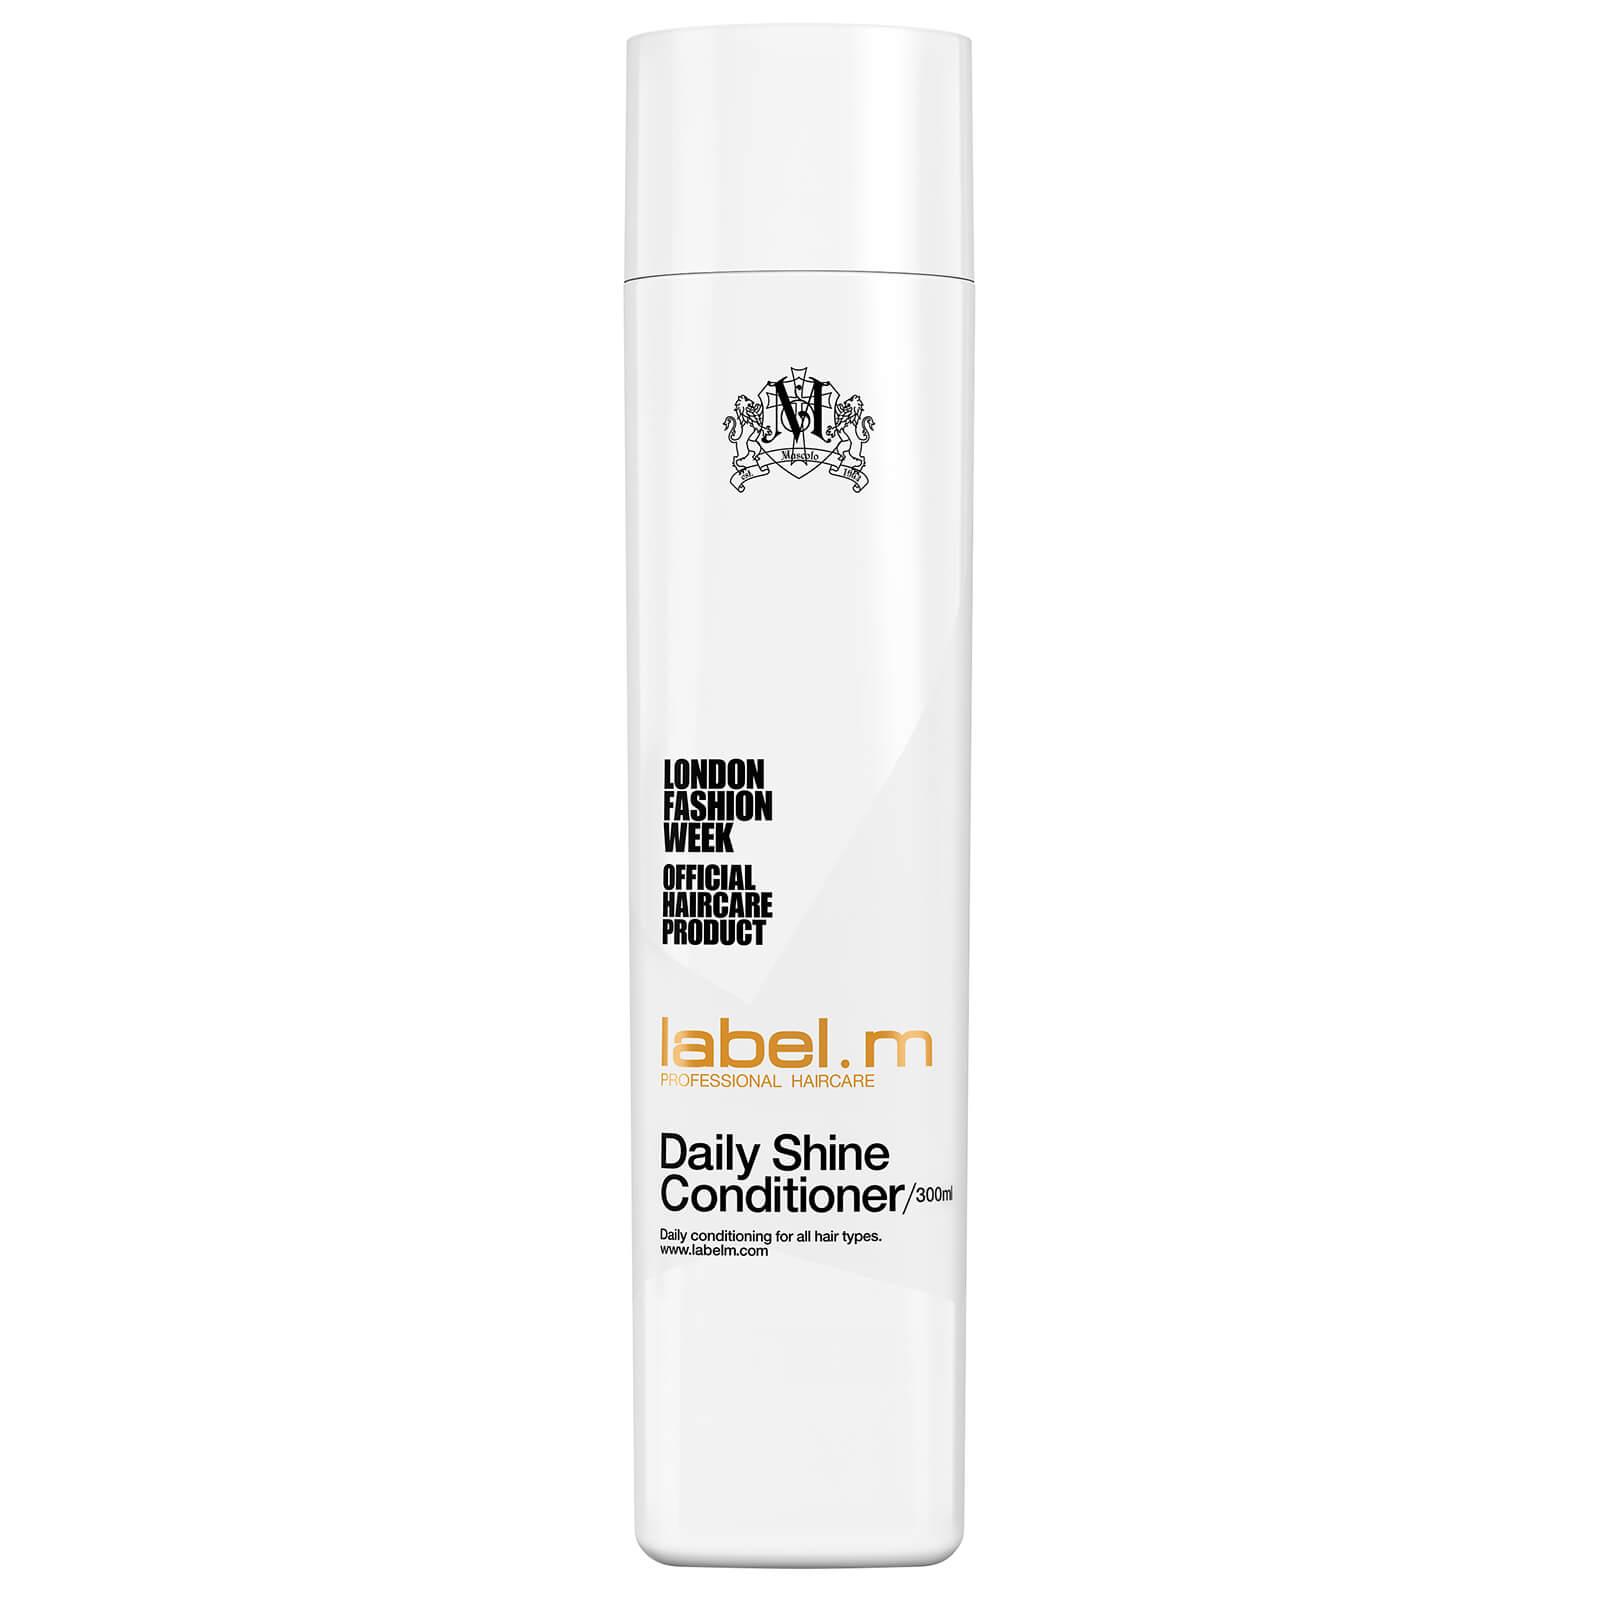 Label.m Daily Shine après-shampoing (300ml)